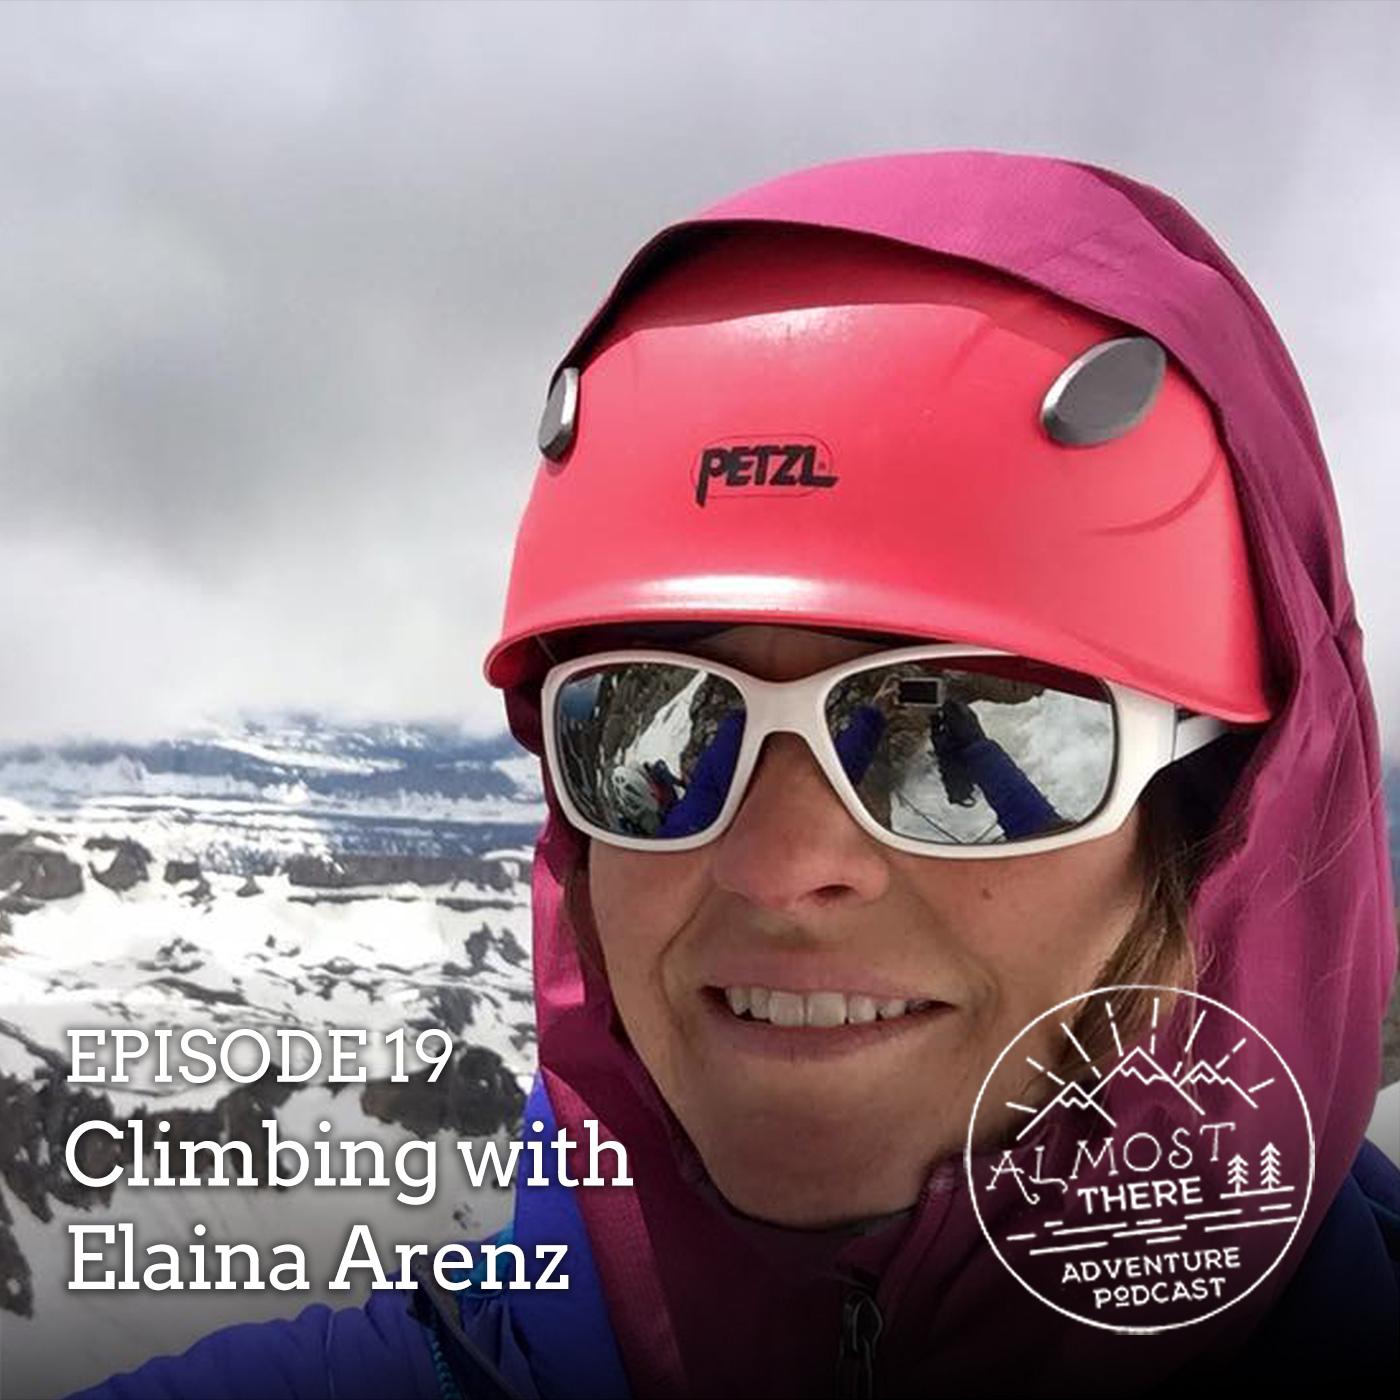 Elaina Arenz